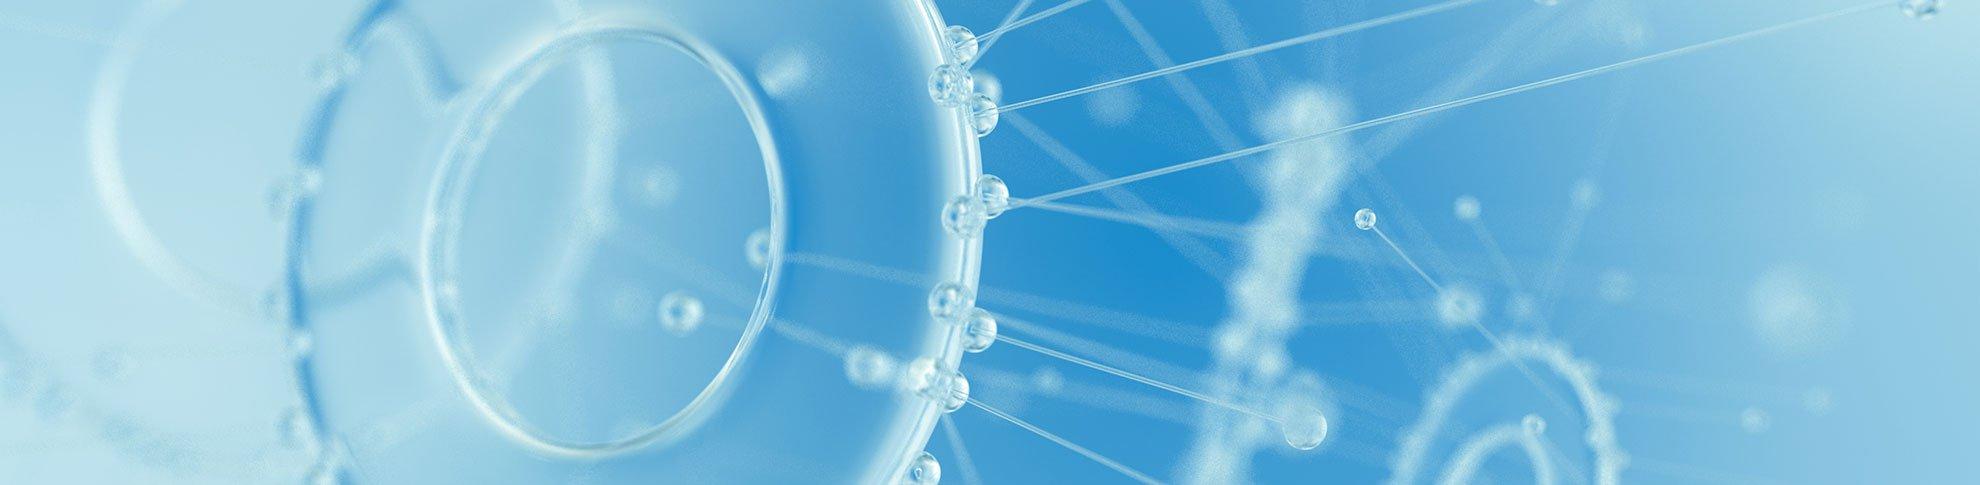 Securing Network Architecture - Part 1 | Optiv | Optiv